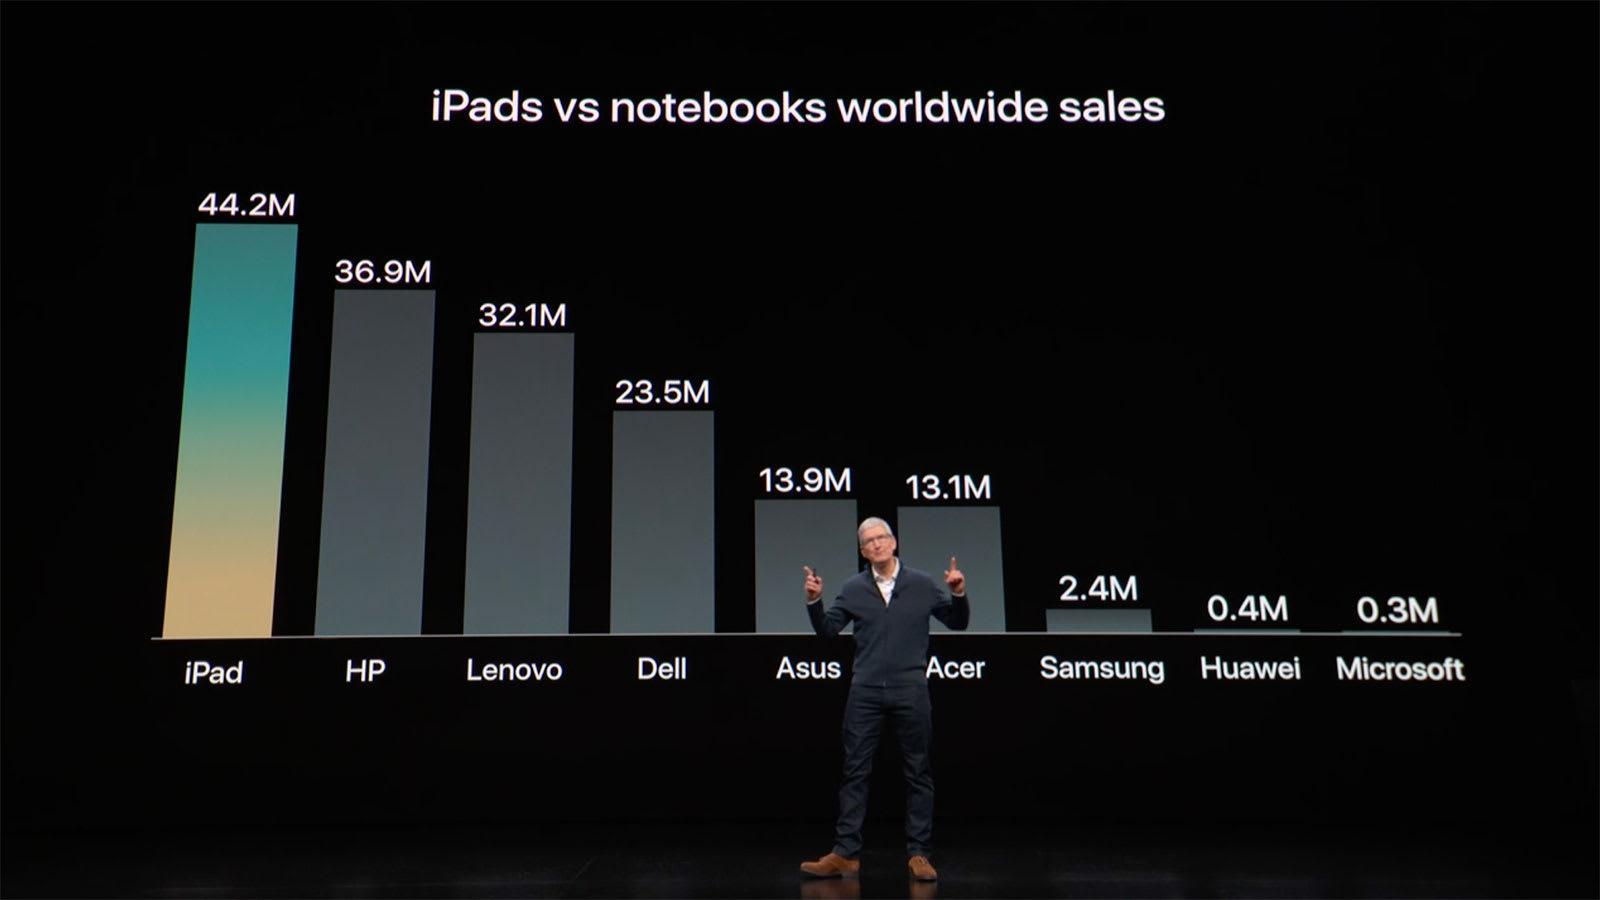 iPads vs notebooks